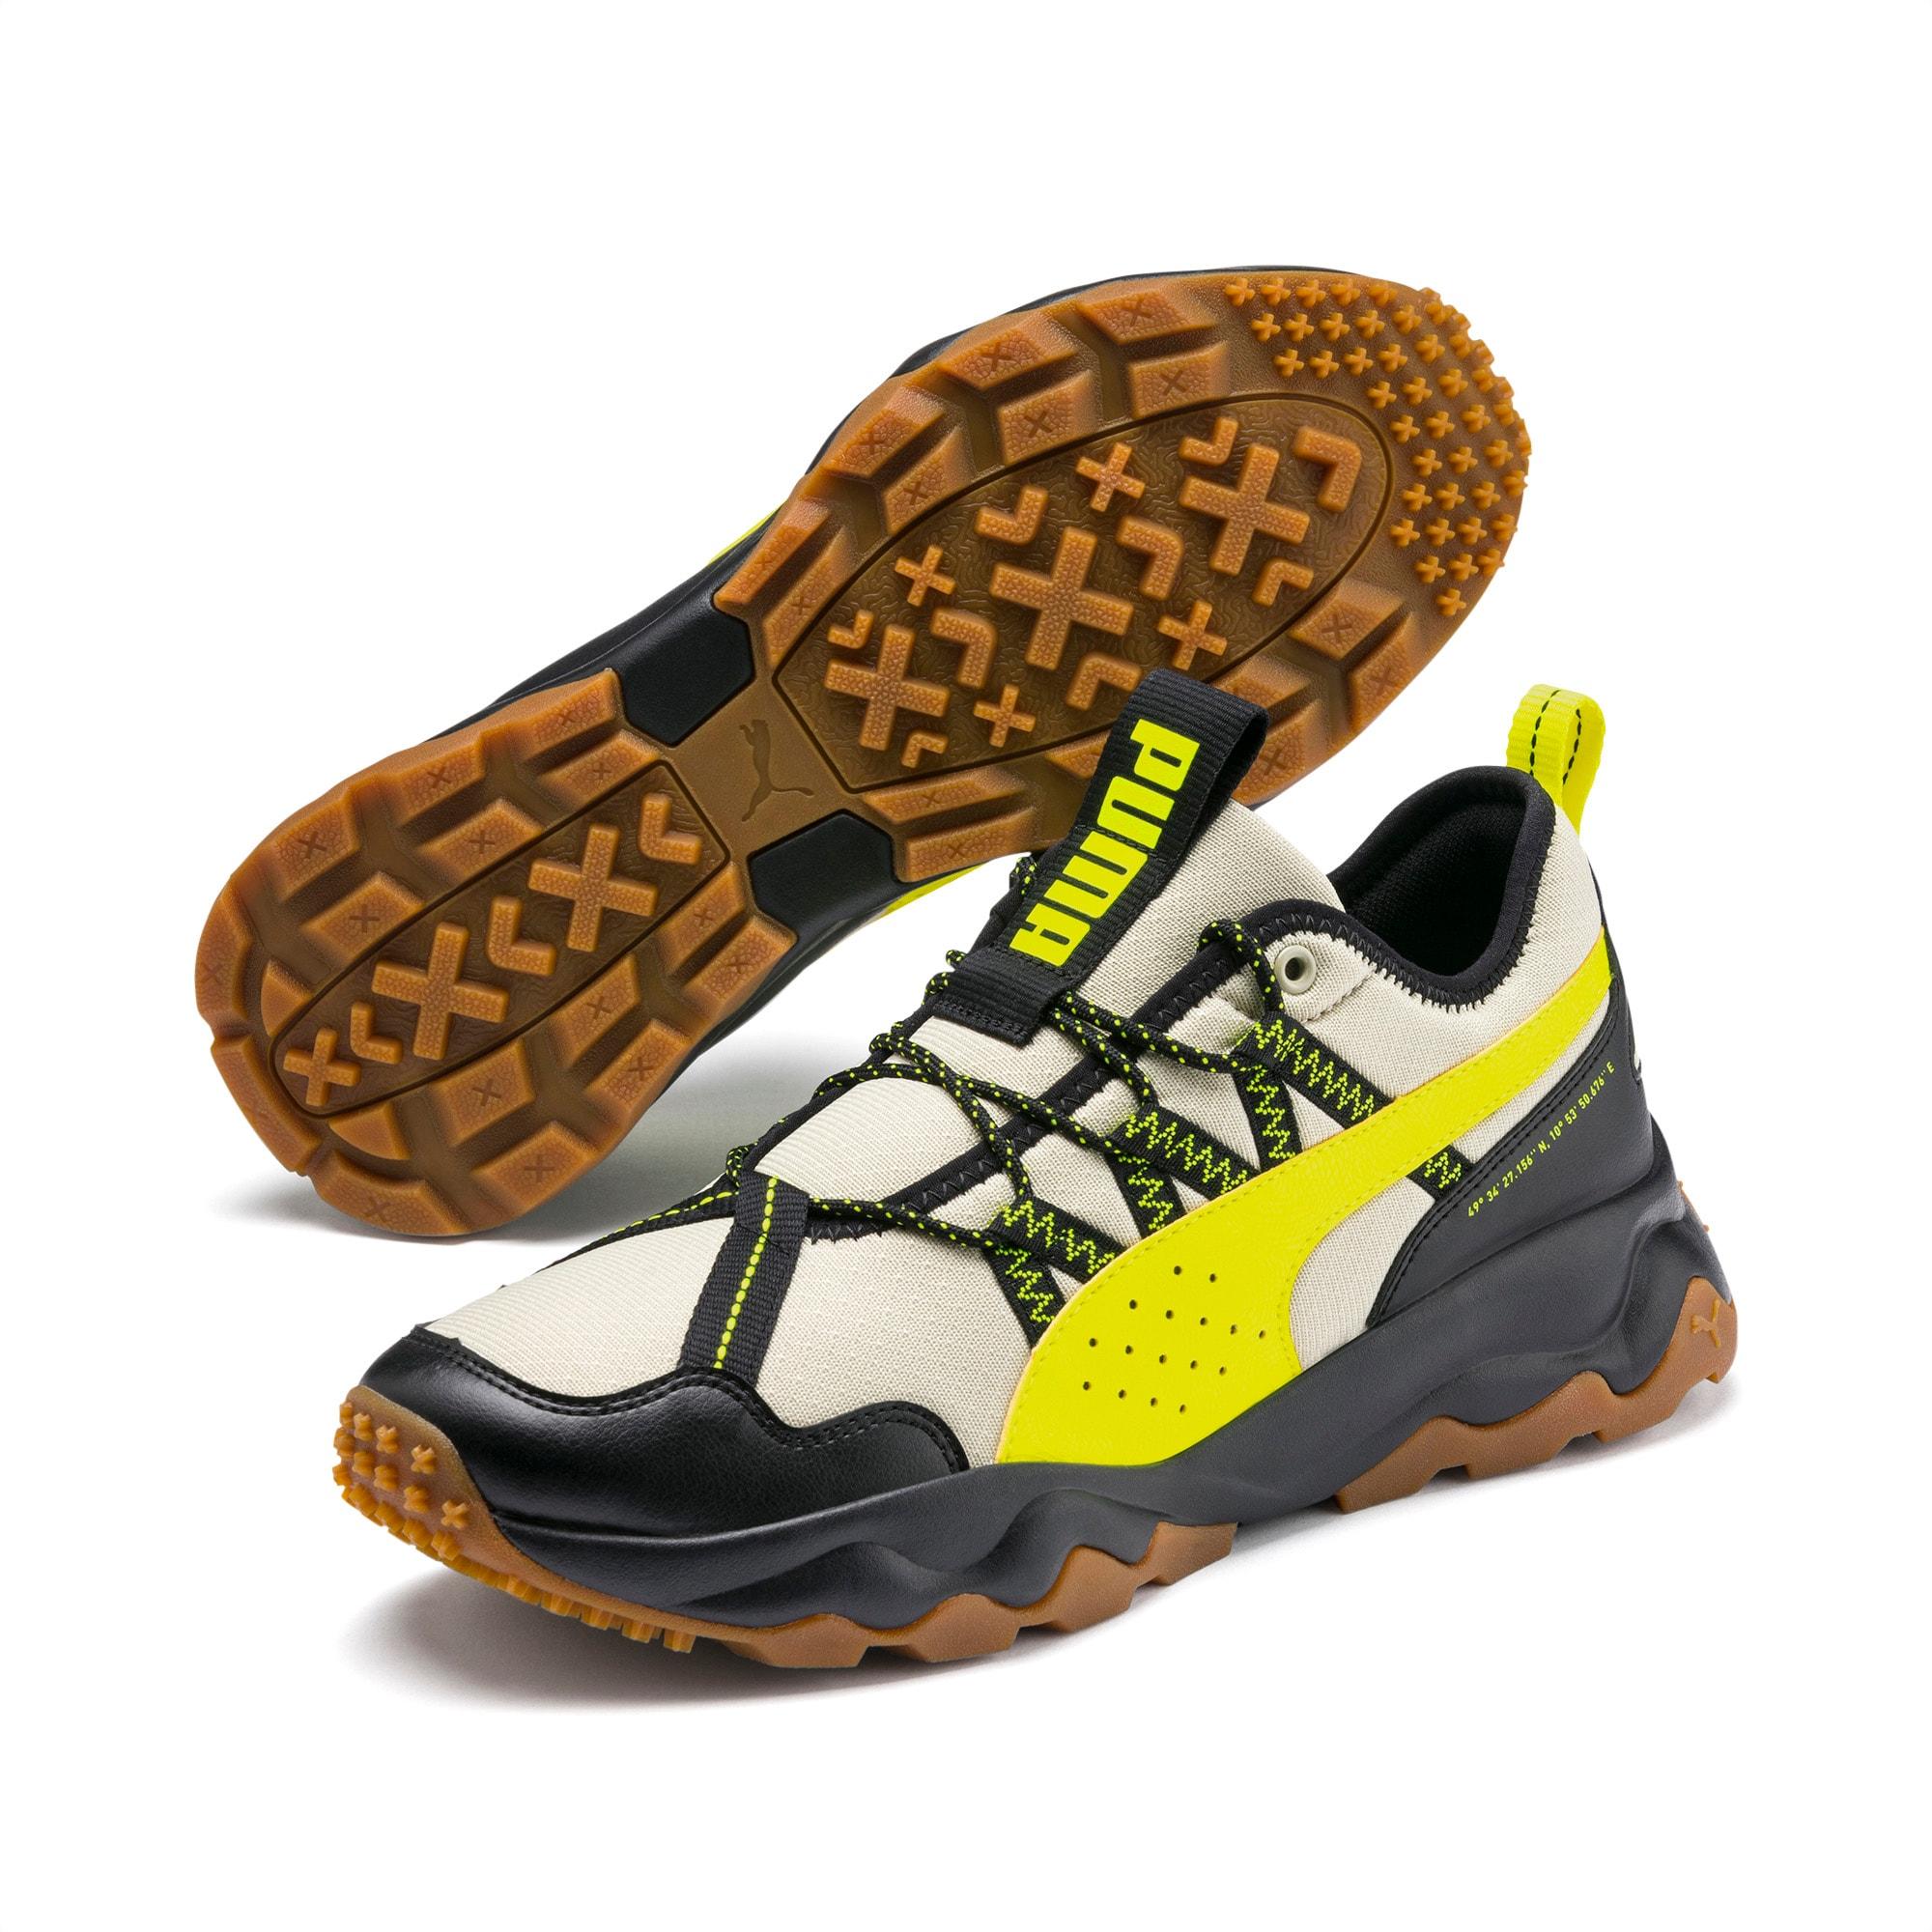 PUMA Ember Trail Men's Running Shoes Men Shoe Running